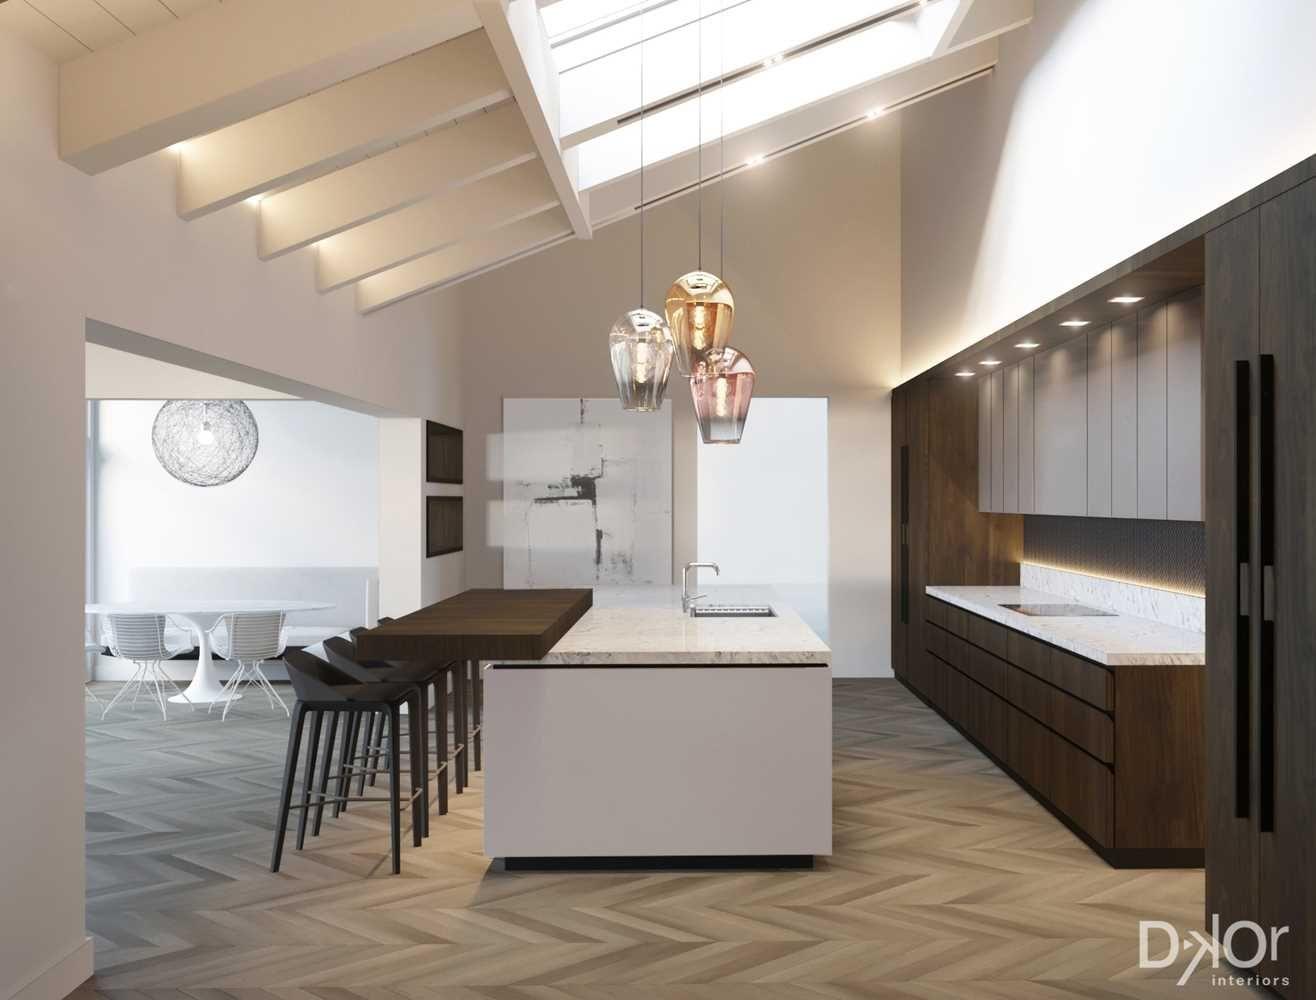 Pinecrest Contemporary Crossover Residential Interior Design From Dkor Interiors Interior Design Basics Interior Design Kitchen Residential Interior Design